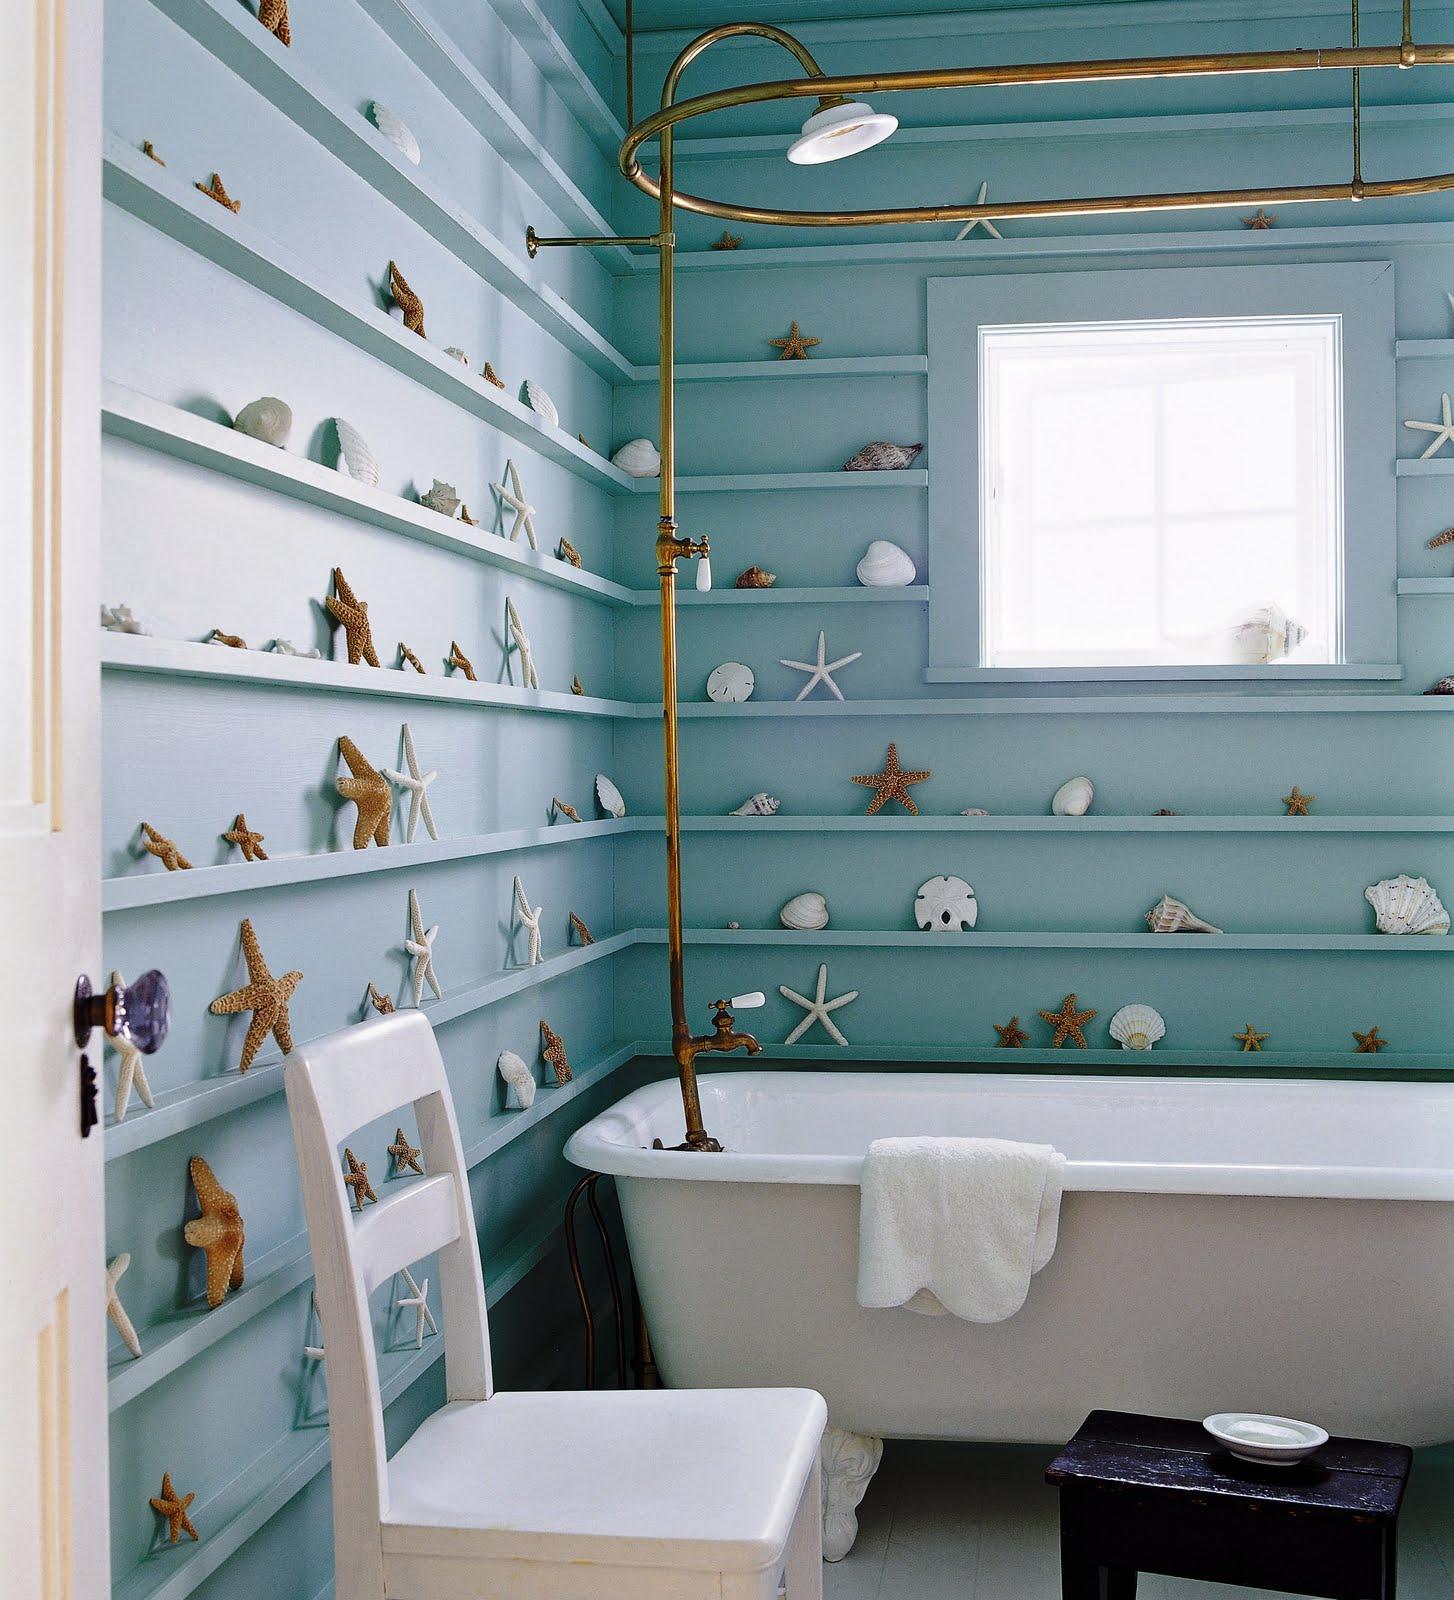 EZ Decorating Know-How: Bathroom Designs - The Nautical ...